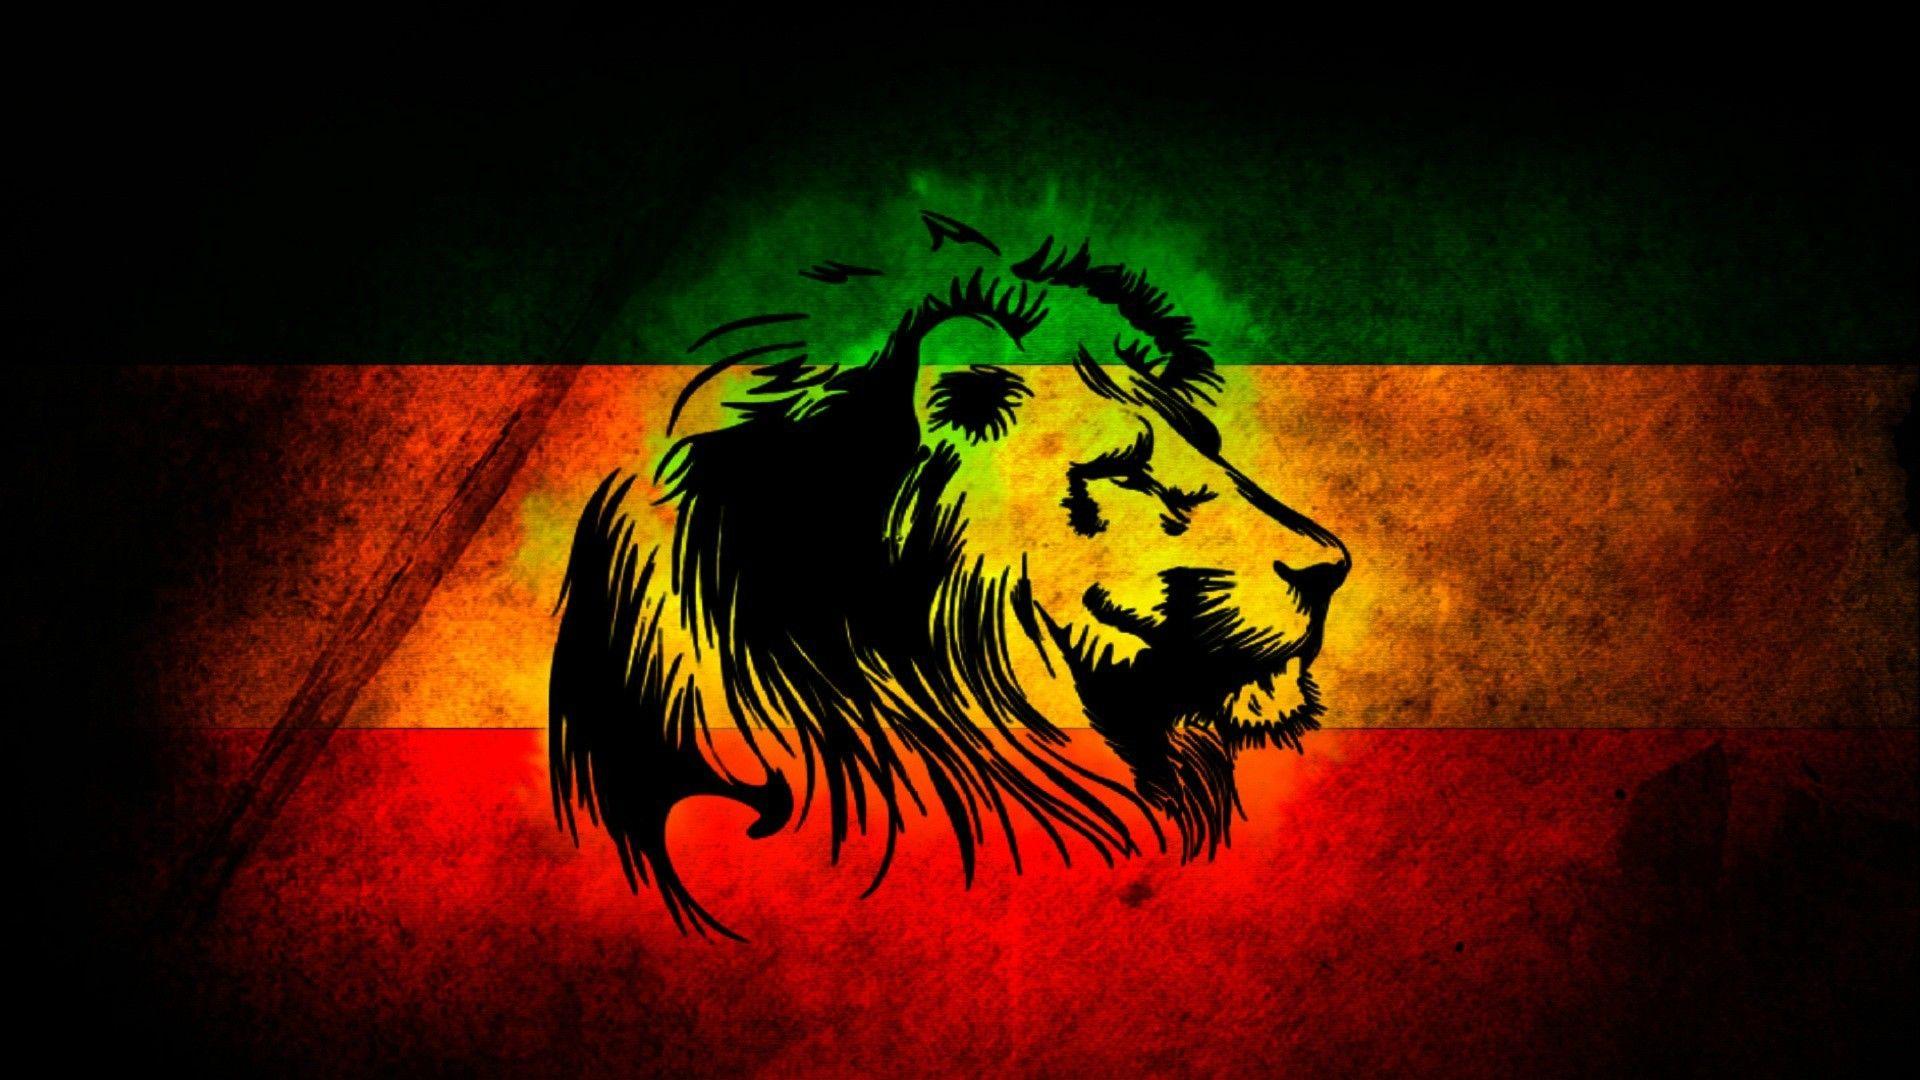 Lion Art Download Wallpaper